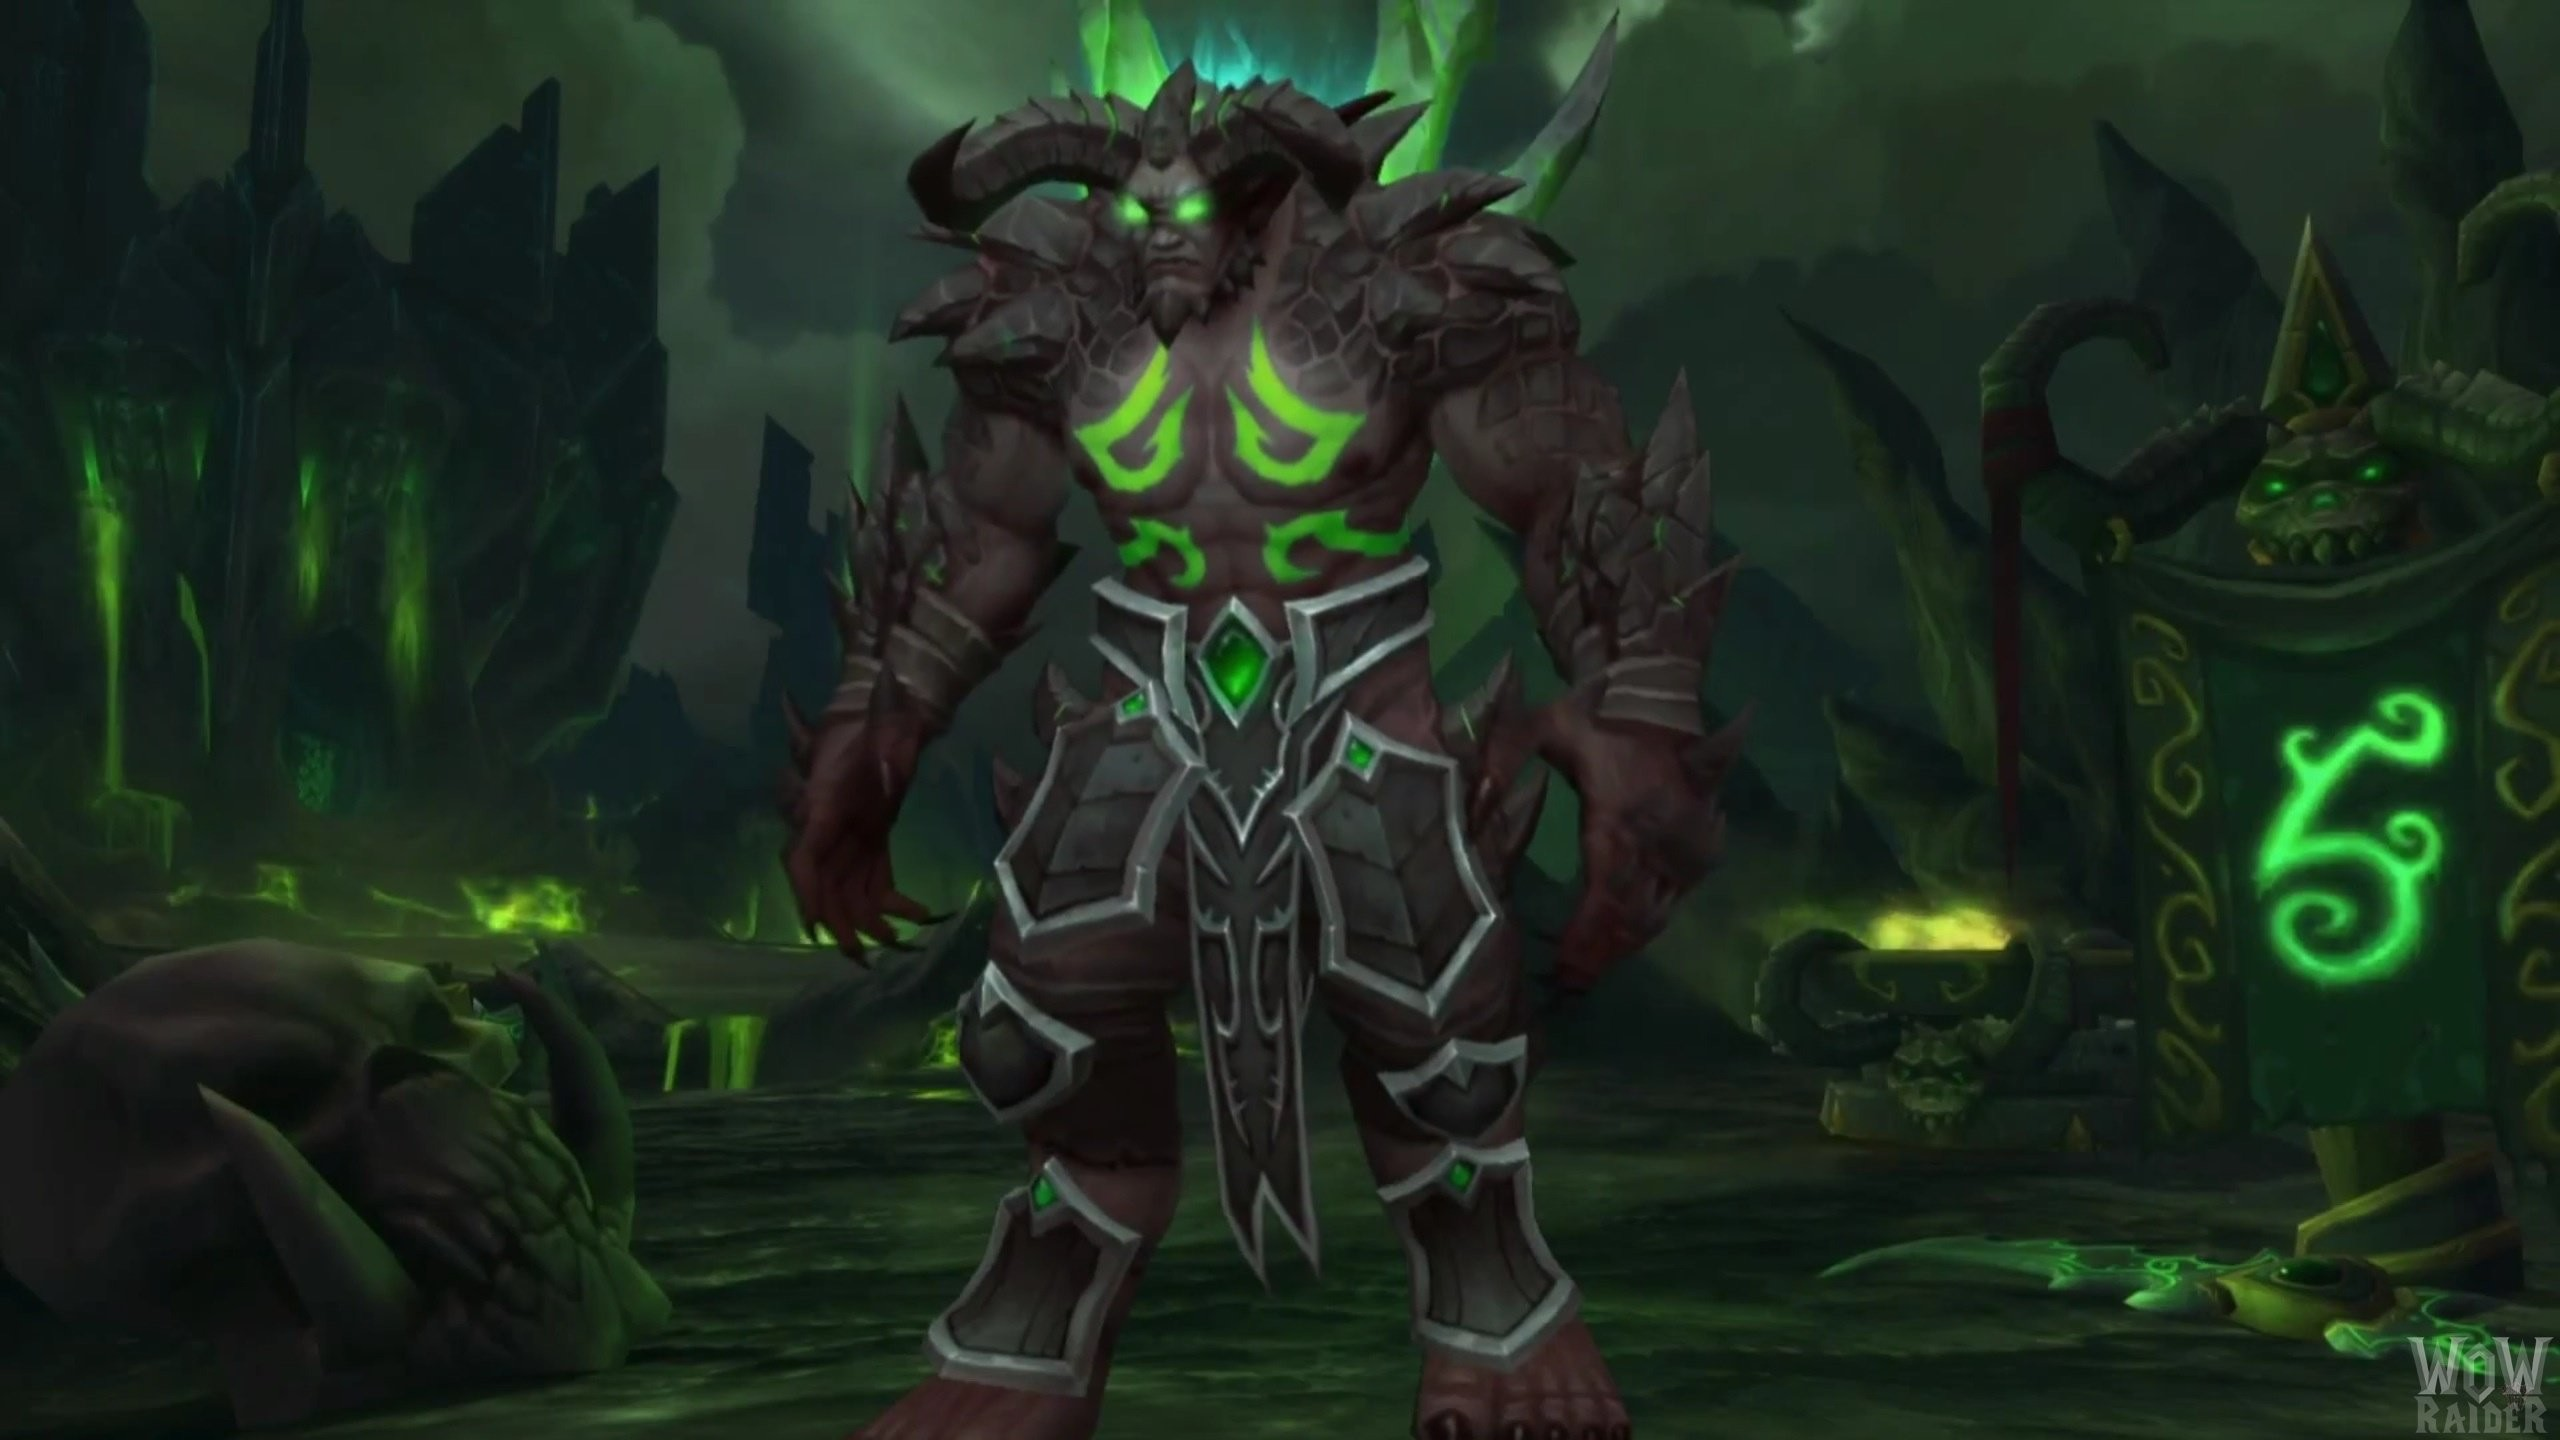 Wow Troll Wallpaper Demon Hunter Demon Form 778653 Hd Wallpaper Backgrounds Download